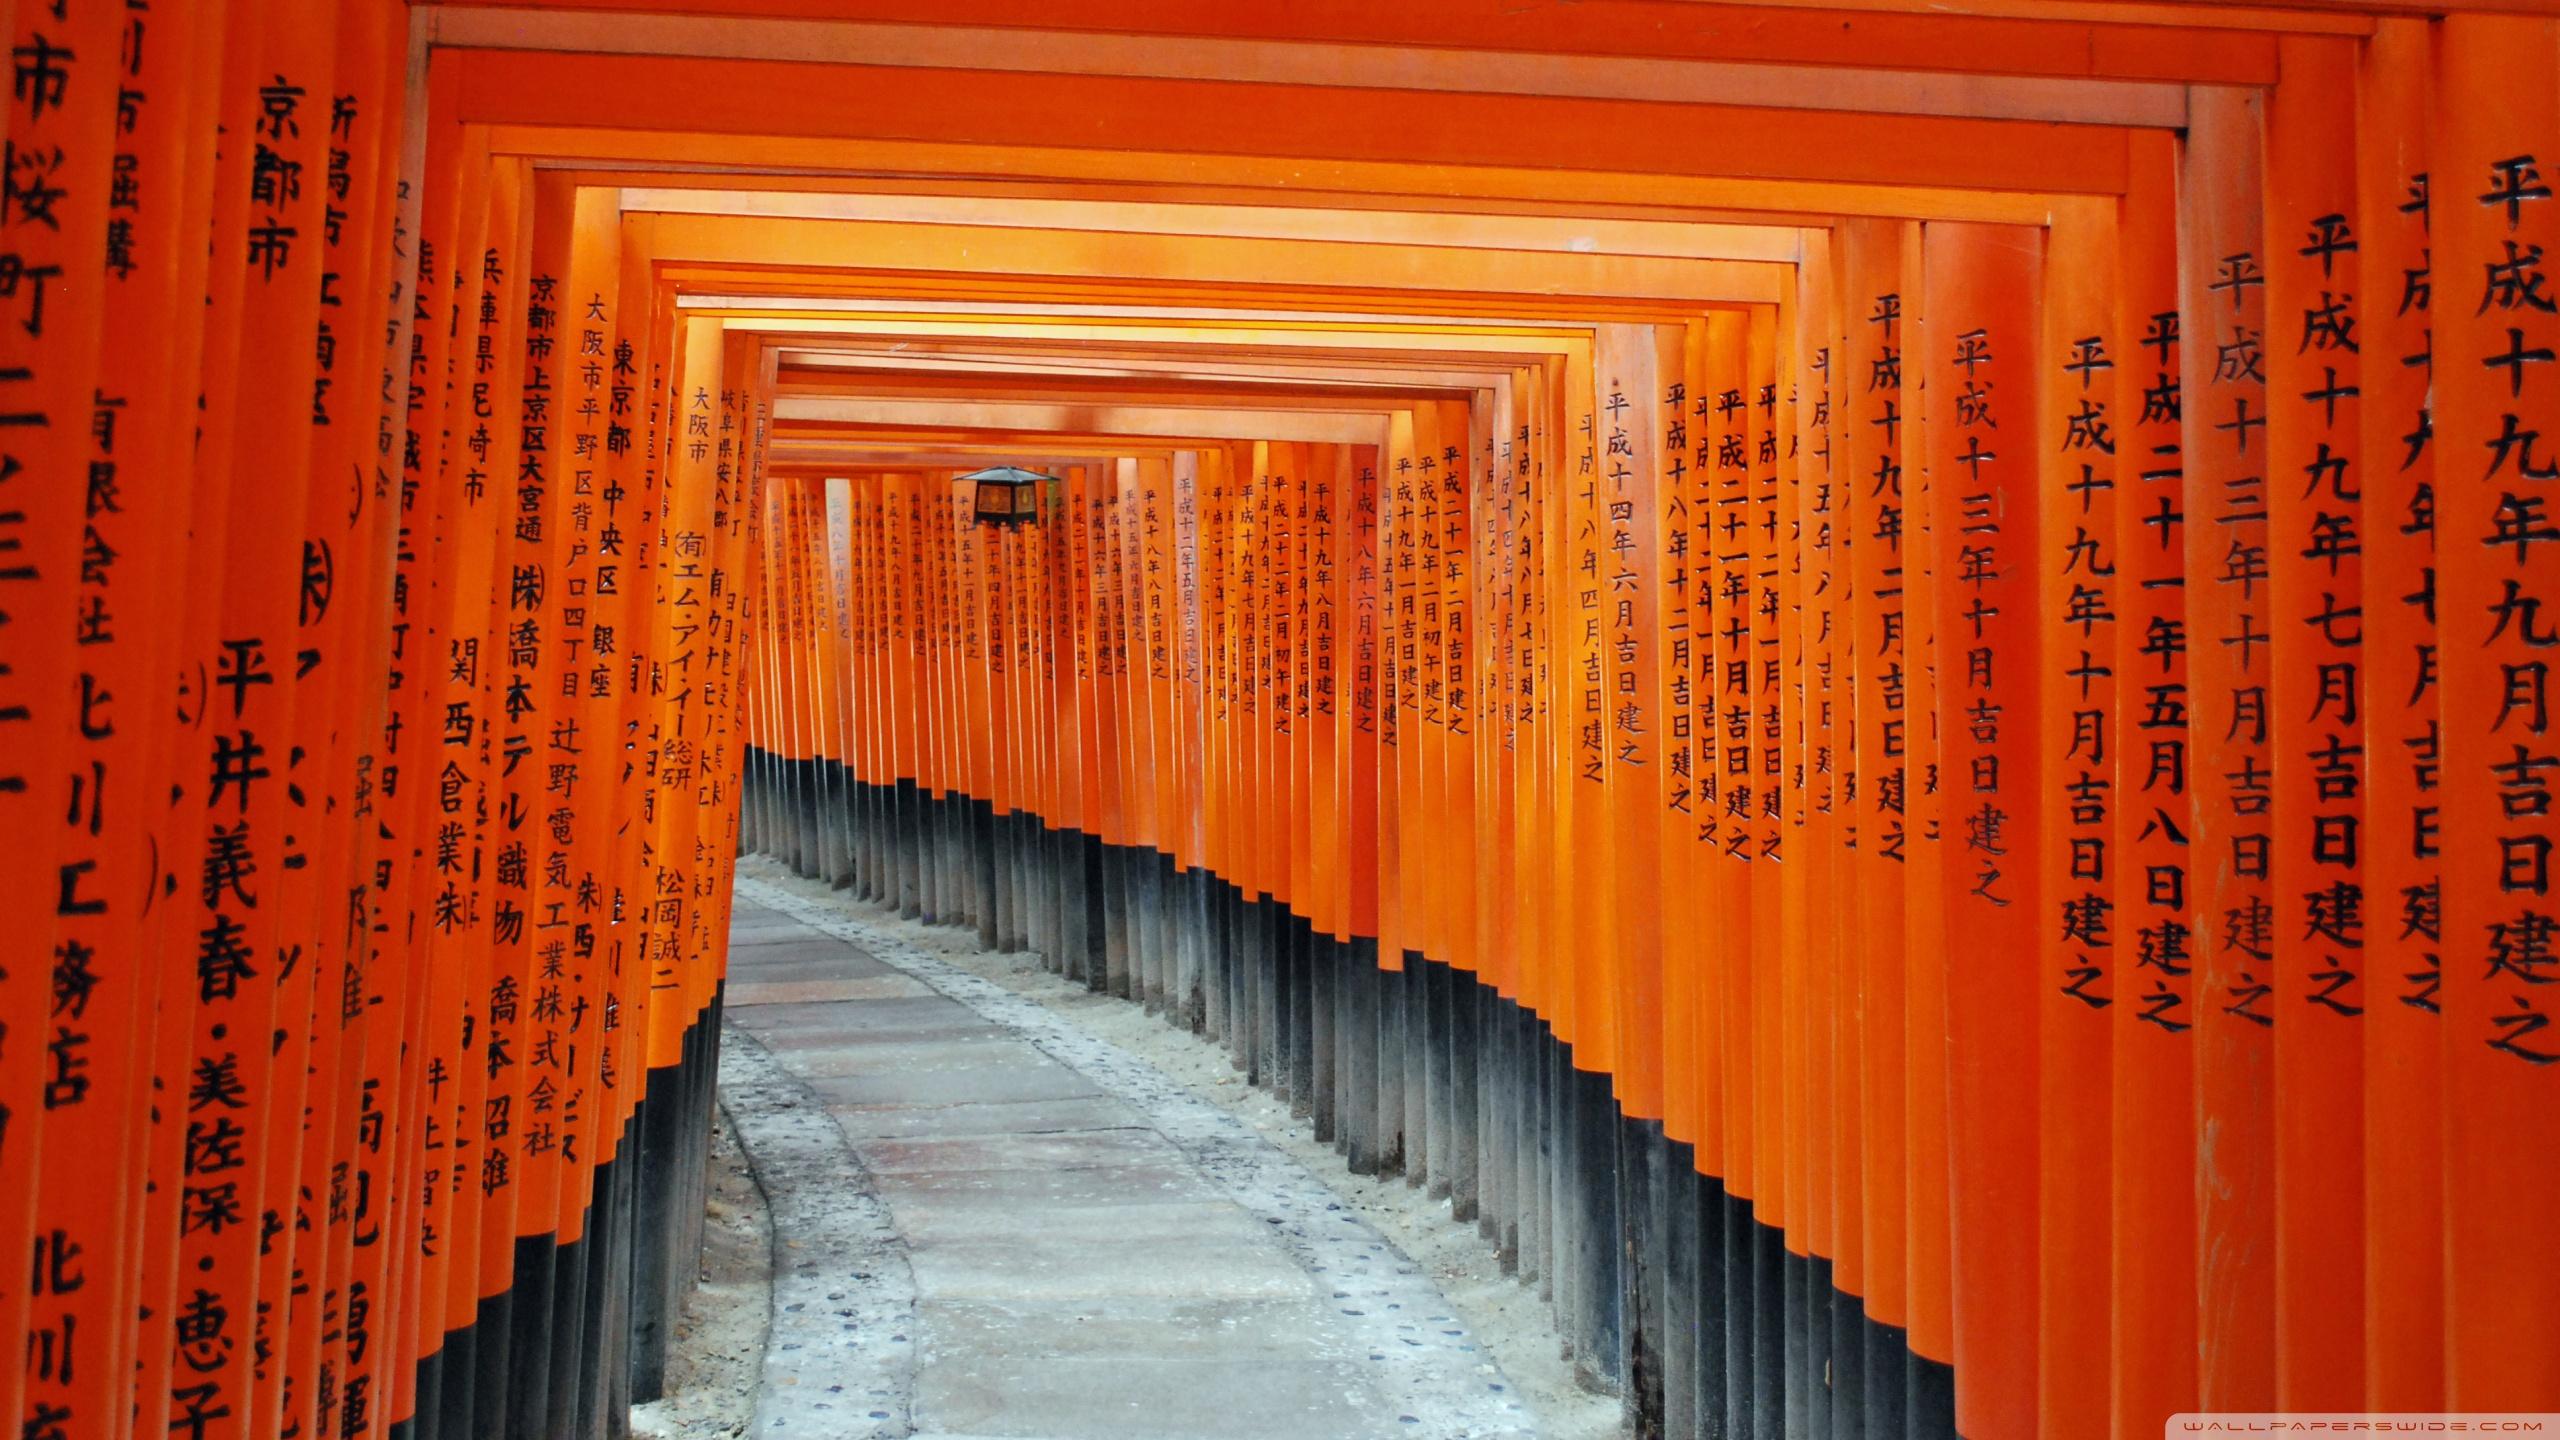 Fushimi Inari Taisha Kyoto Japan 4K HD Desktop Wallpaper for 2560x1440